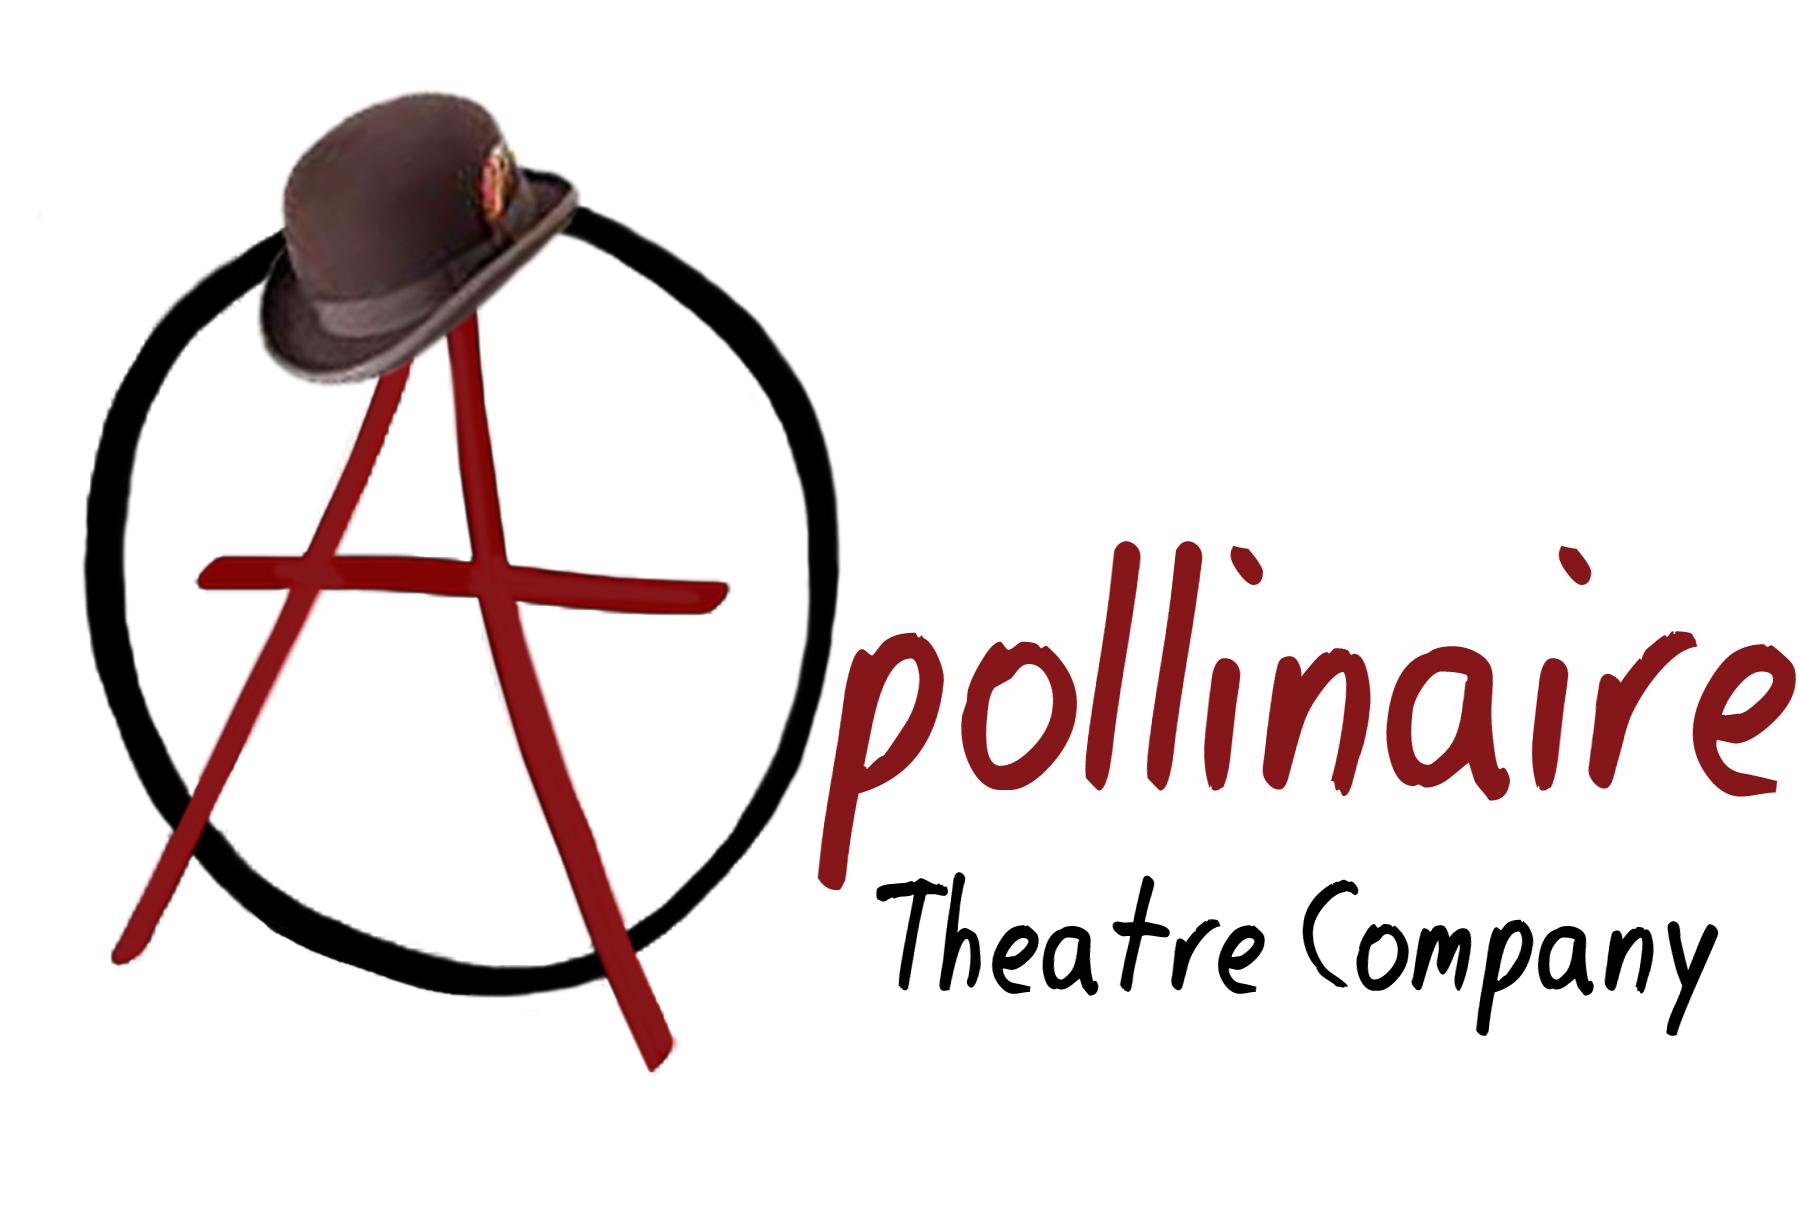 apollinaire_logo_final_300_dpi_(1).jpg